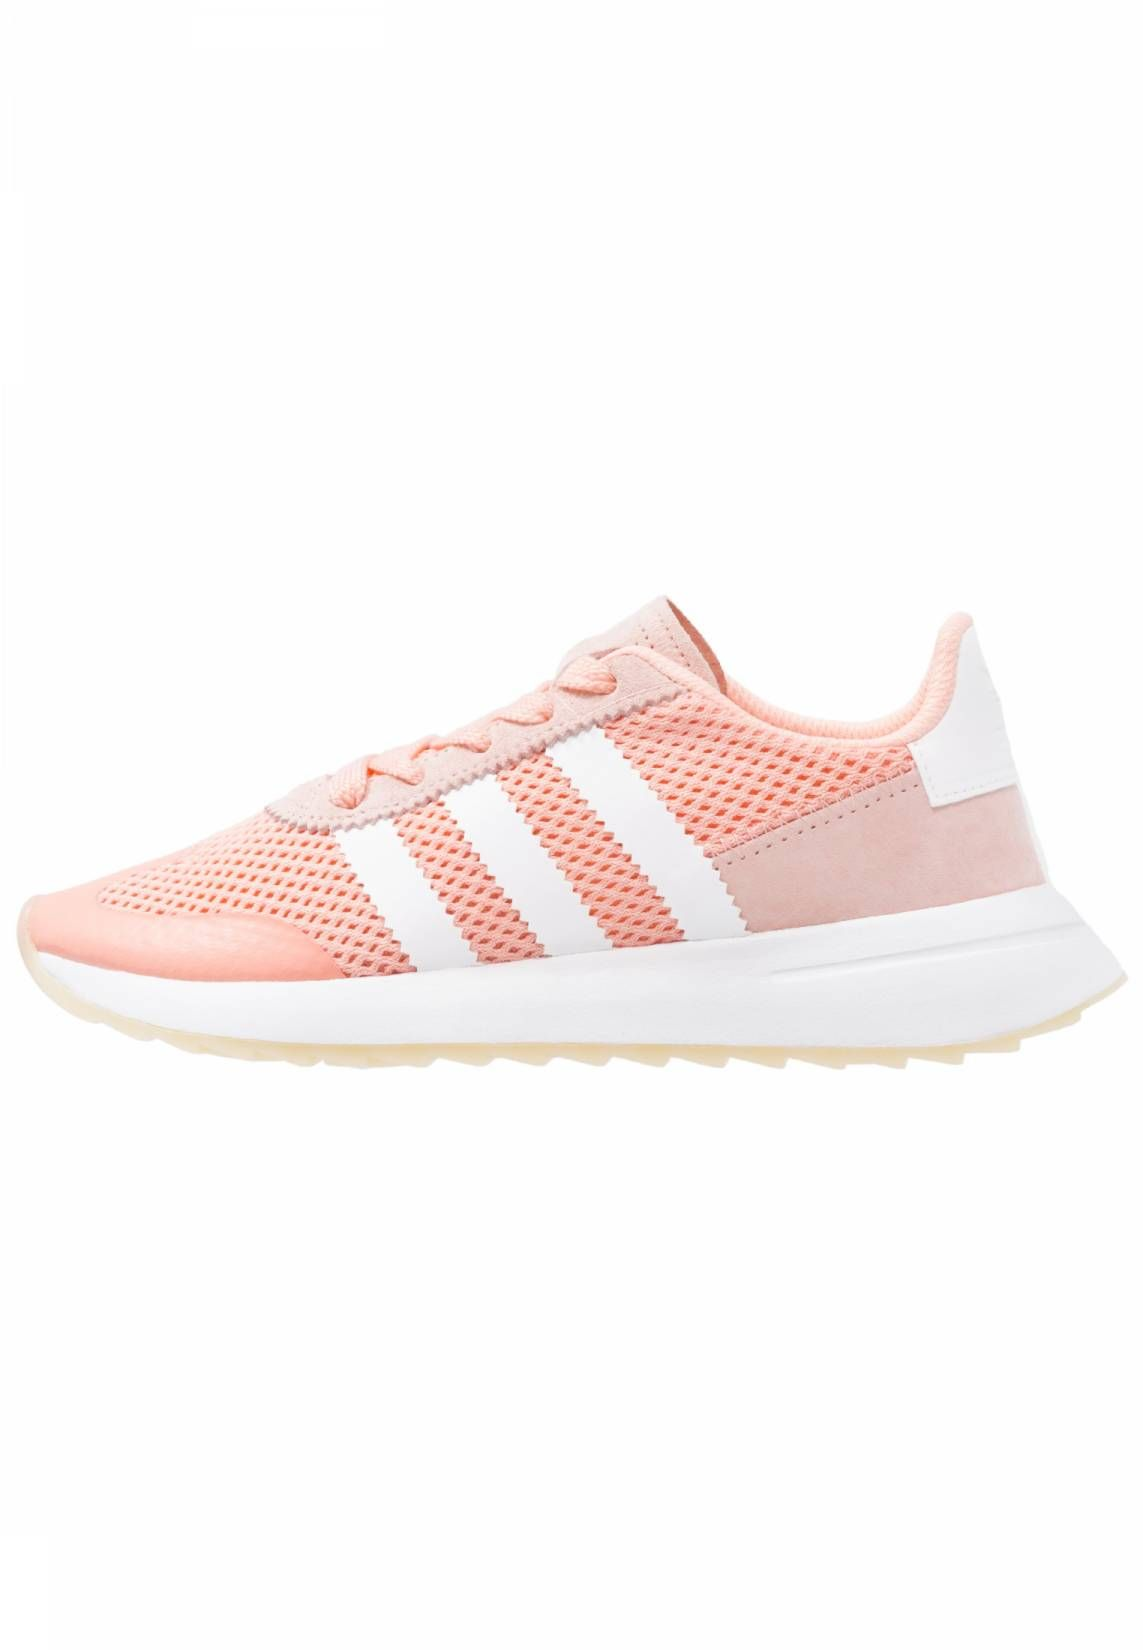 adidas Originals. FLASHBACK Trainers haze coralwhite